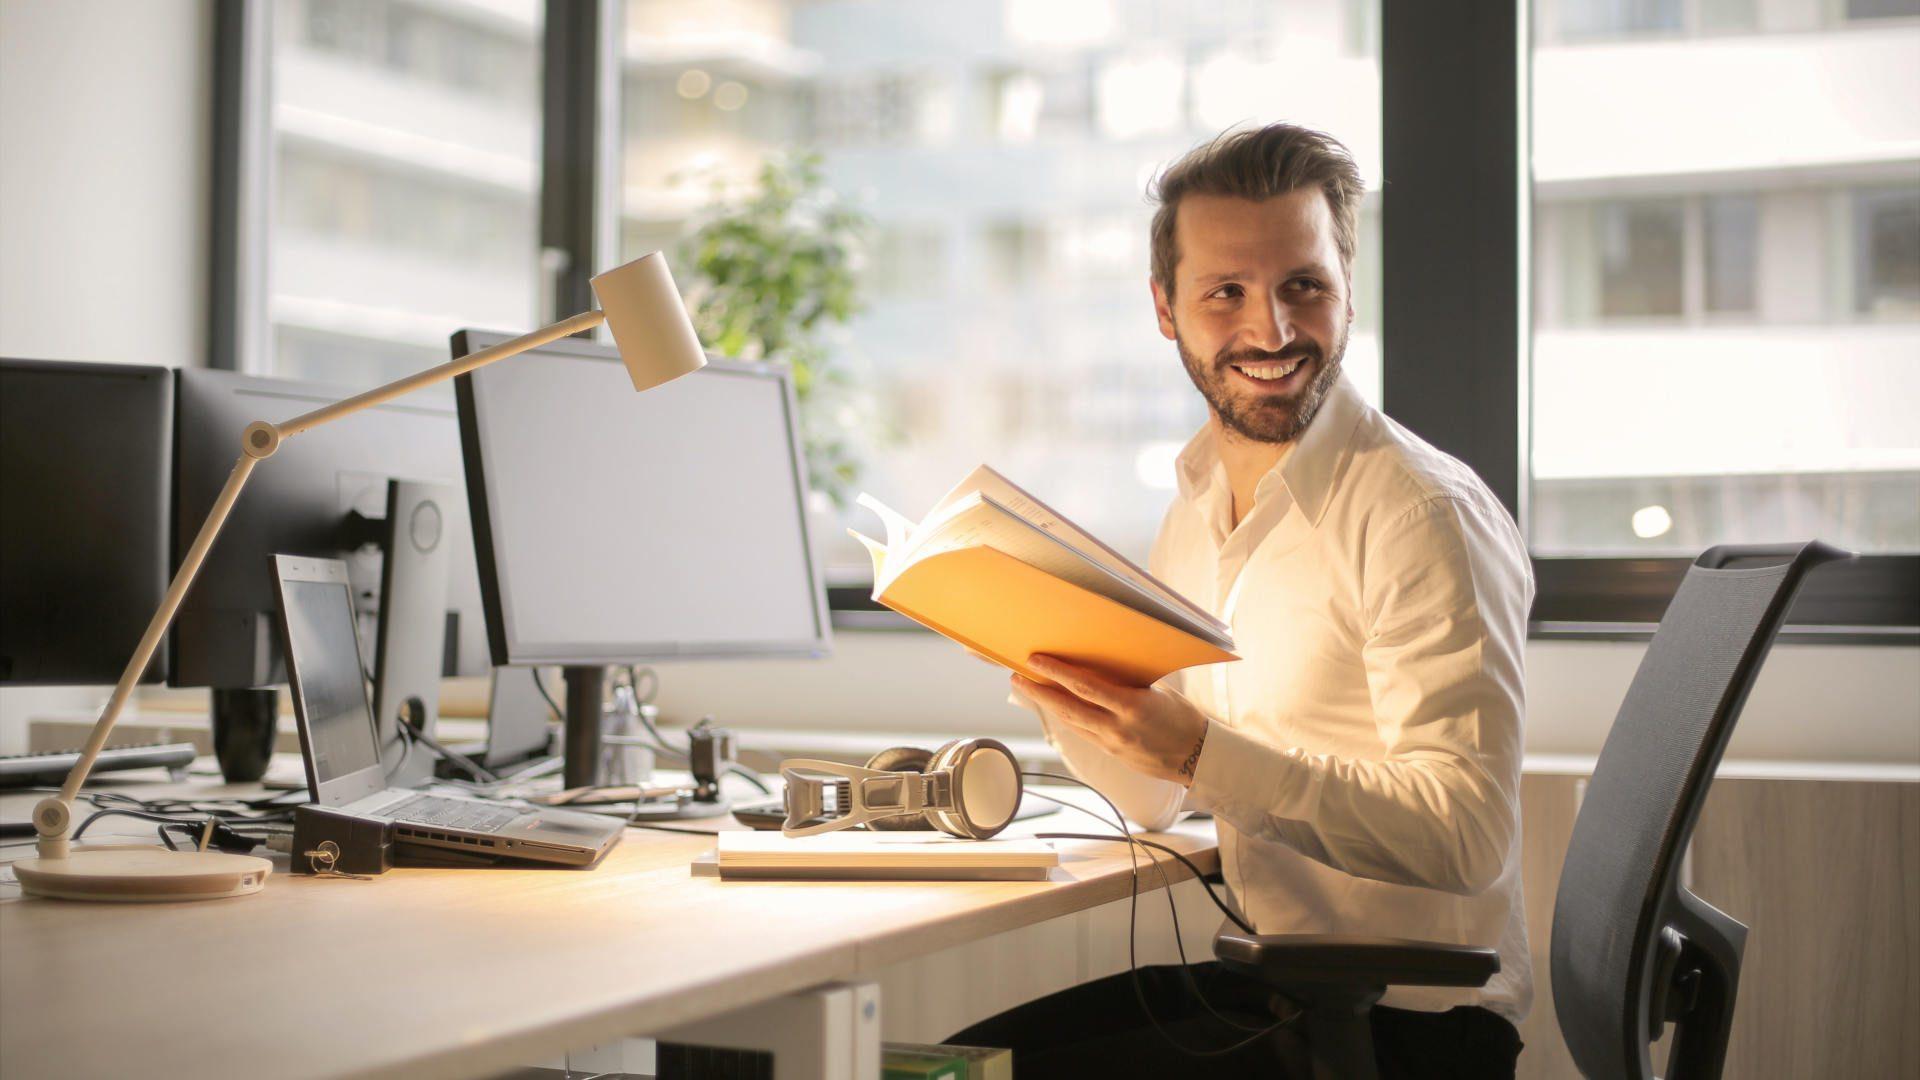 Nasmijan muškarac u kancelariji